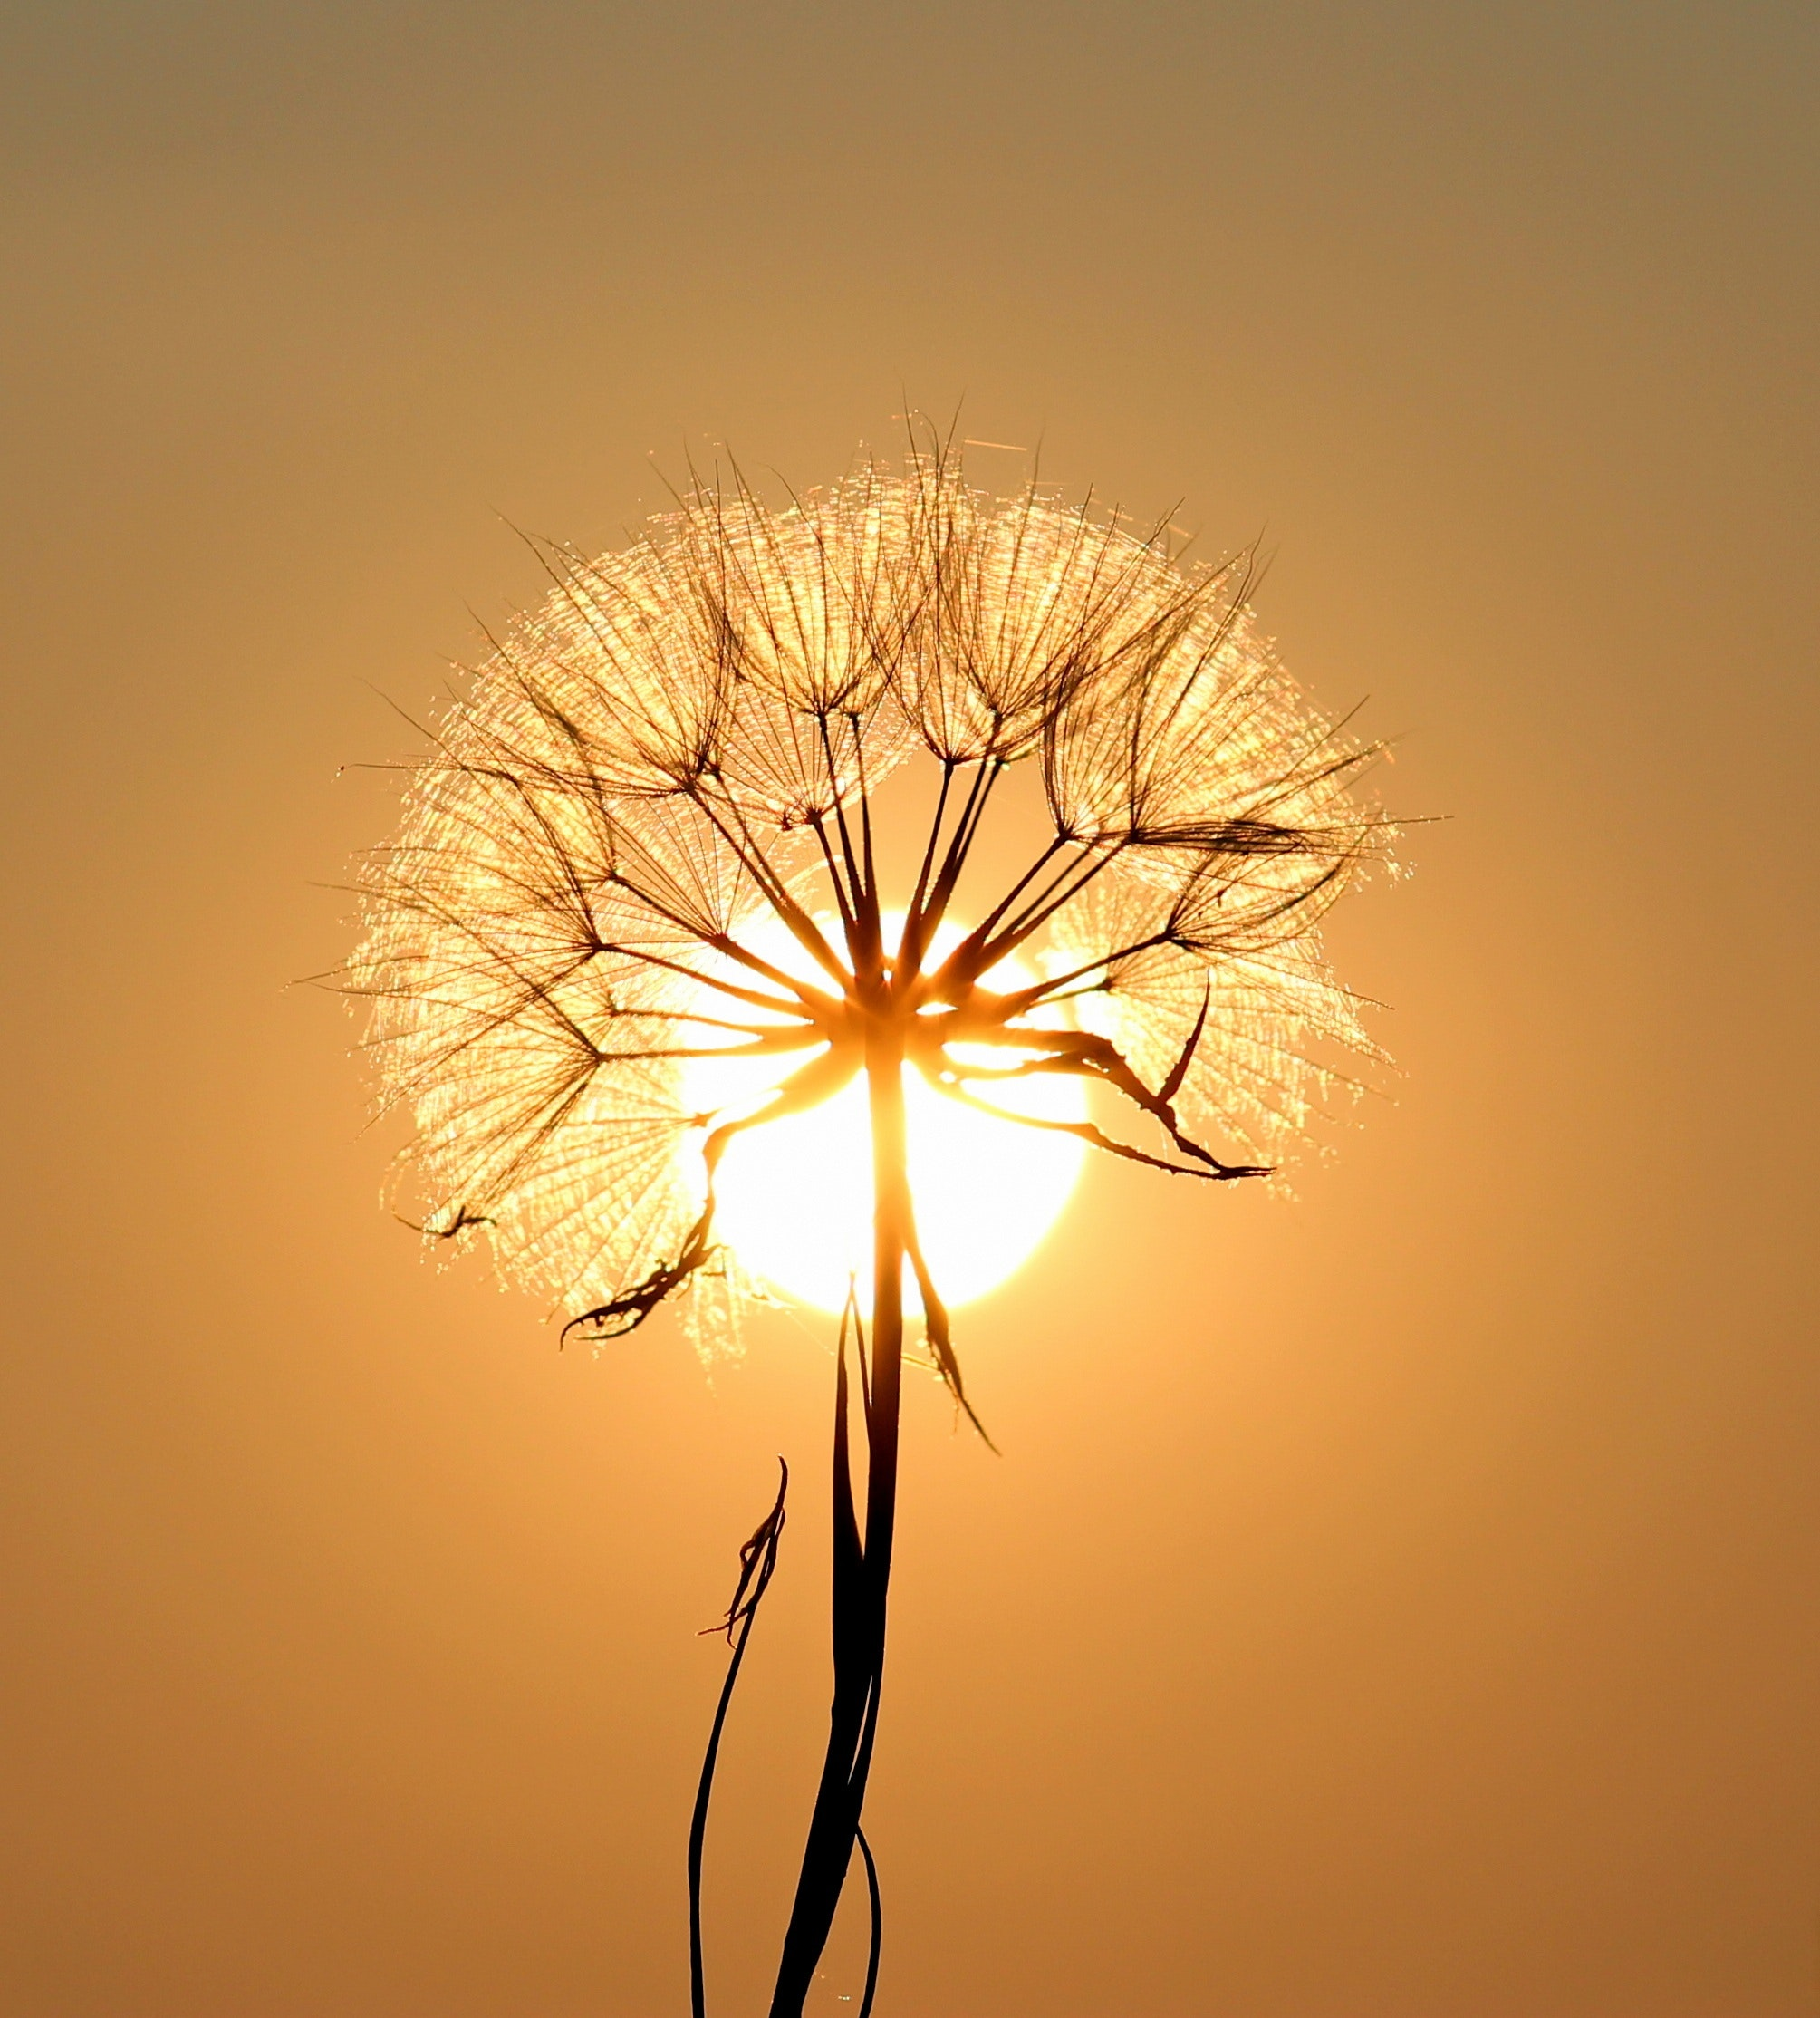 White dandelion flower free stock photo free download mightylinksfo